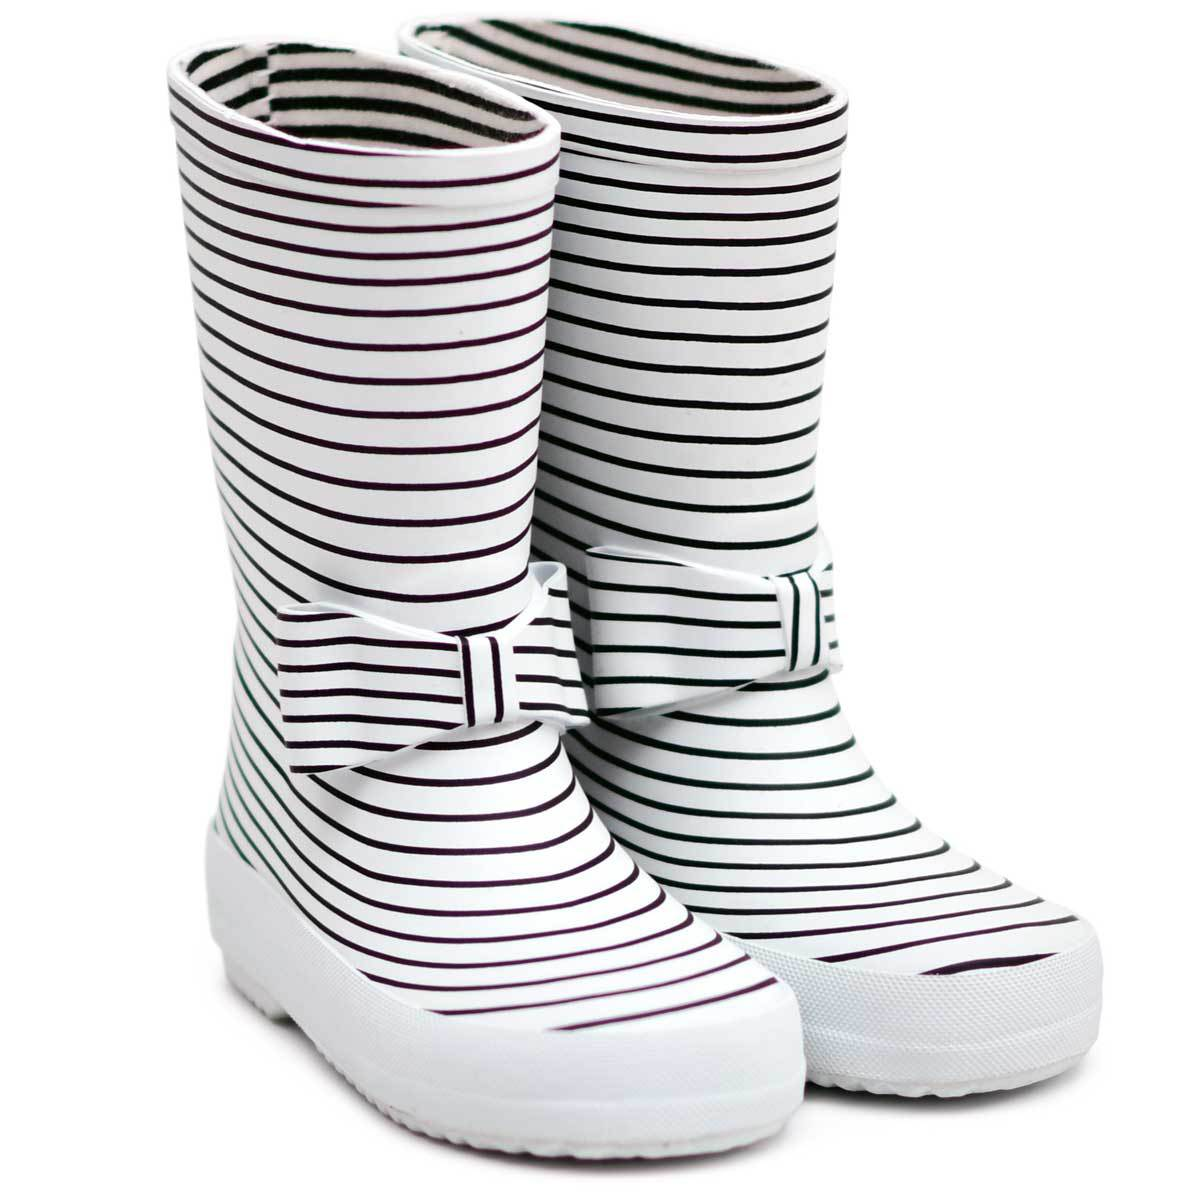 Chaussons & Chaussures Bottes Boxbonaute Bowtie - 27 Bottes Boxbonaute Bowtie - 27